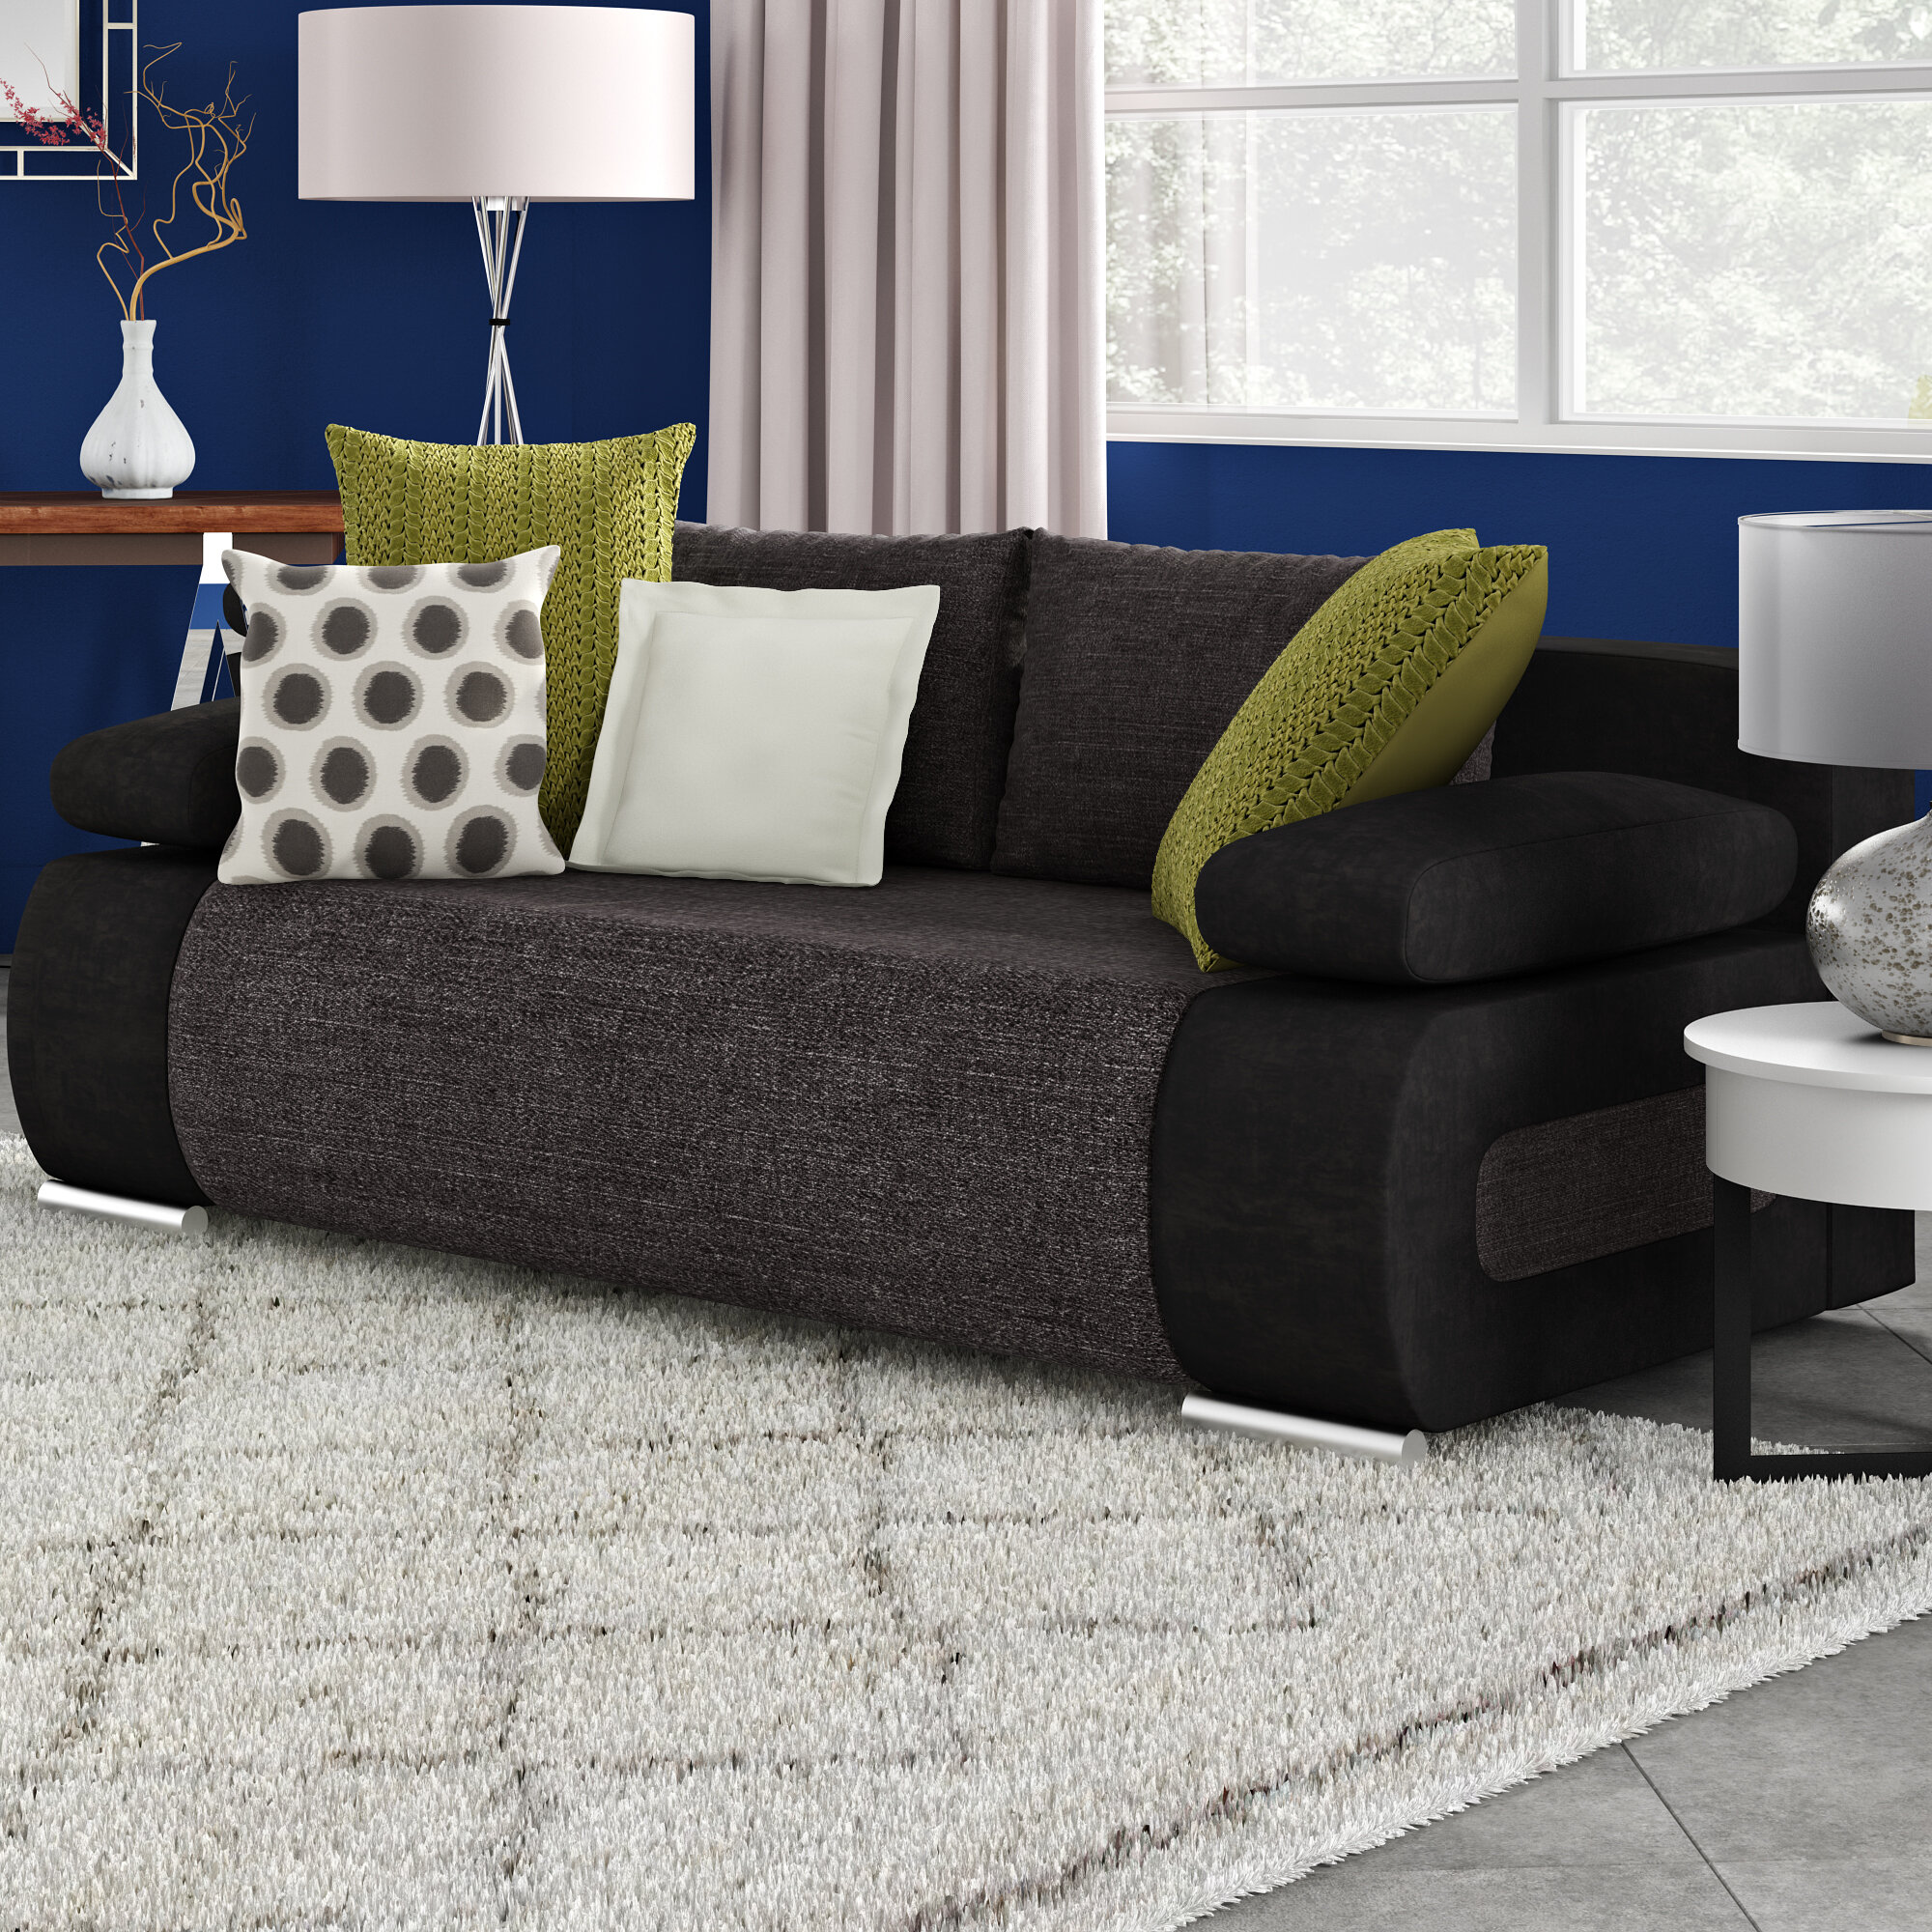 collection ab. Black Bedroom Furniture Sets. Home Design Ideas